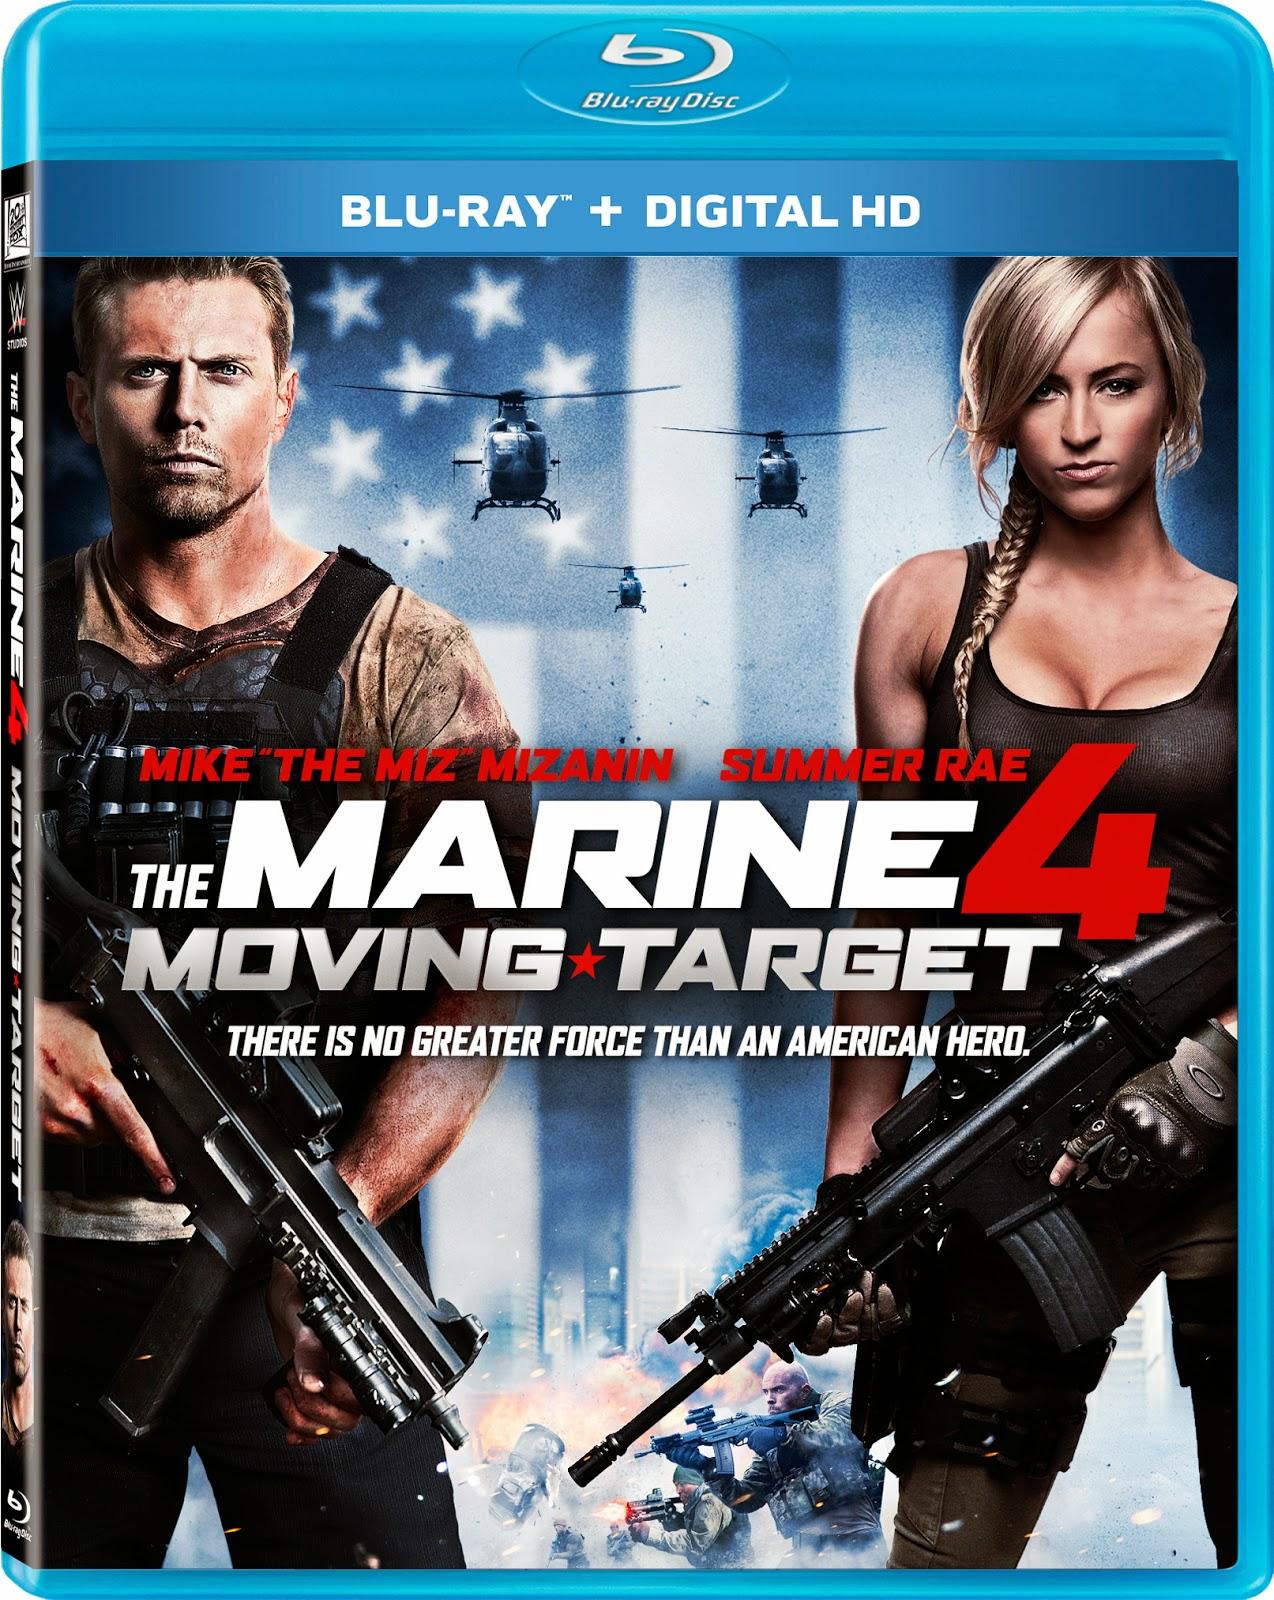 Giveaway: #TheMarine4 Moving Targets Blu-ray & Digital HD